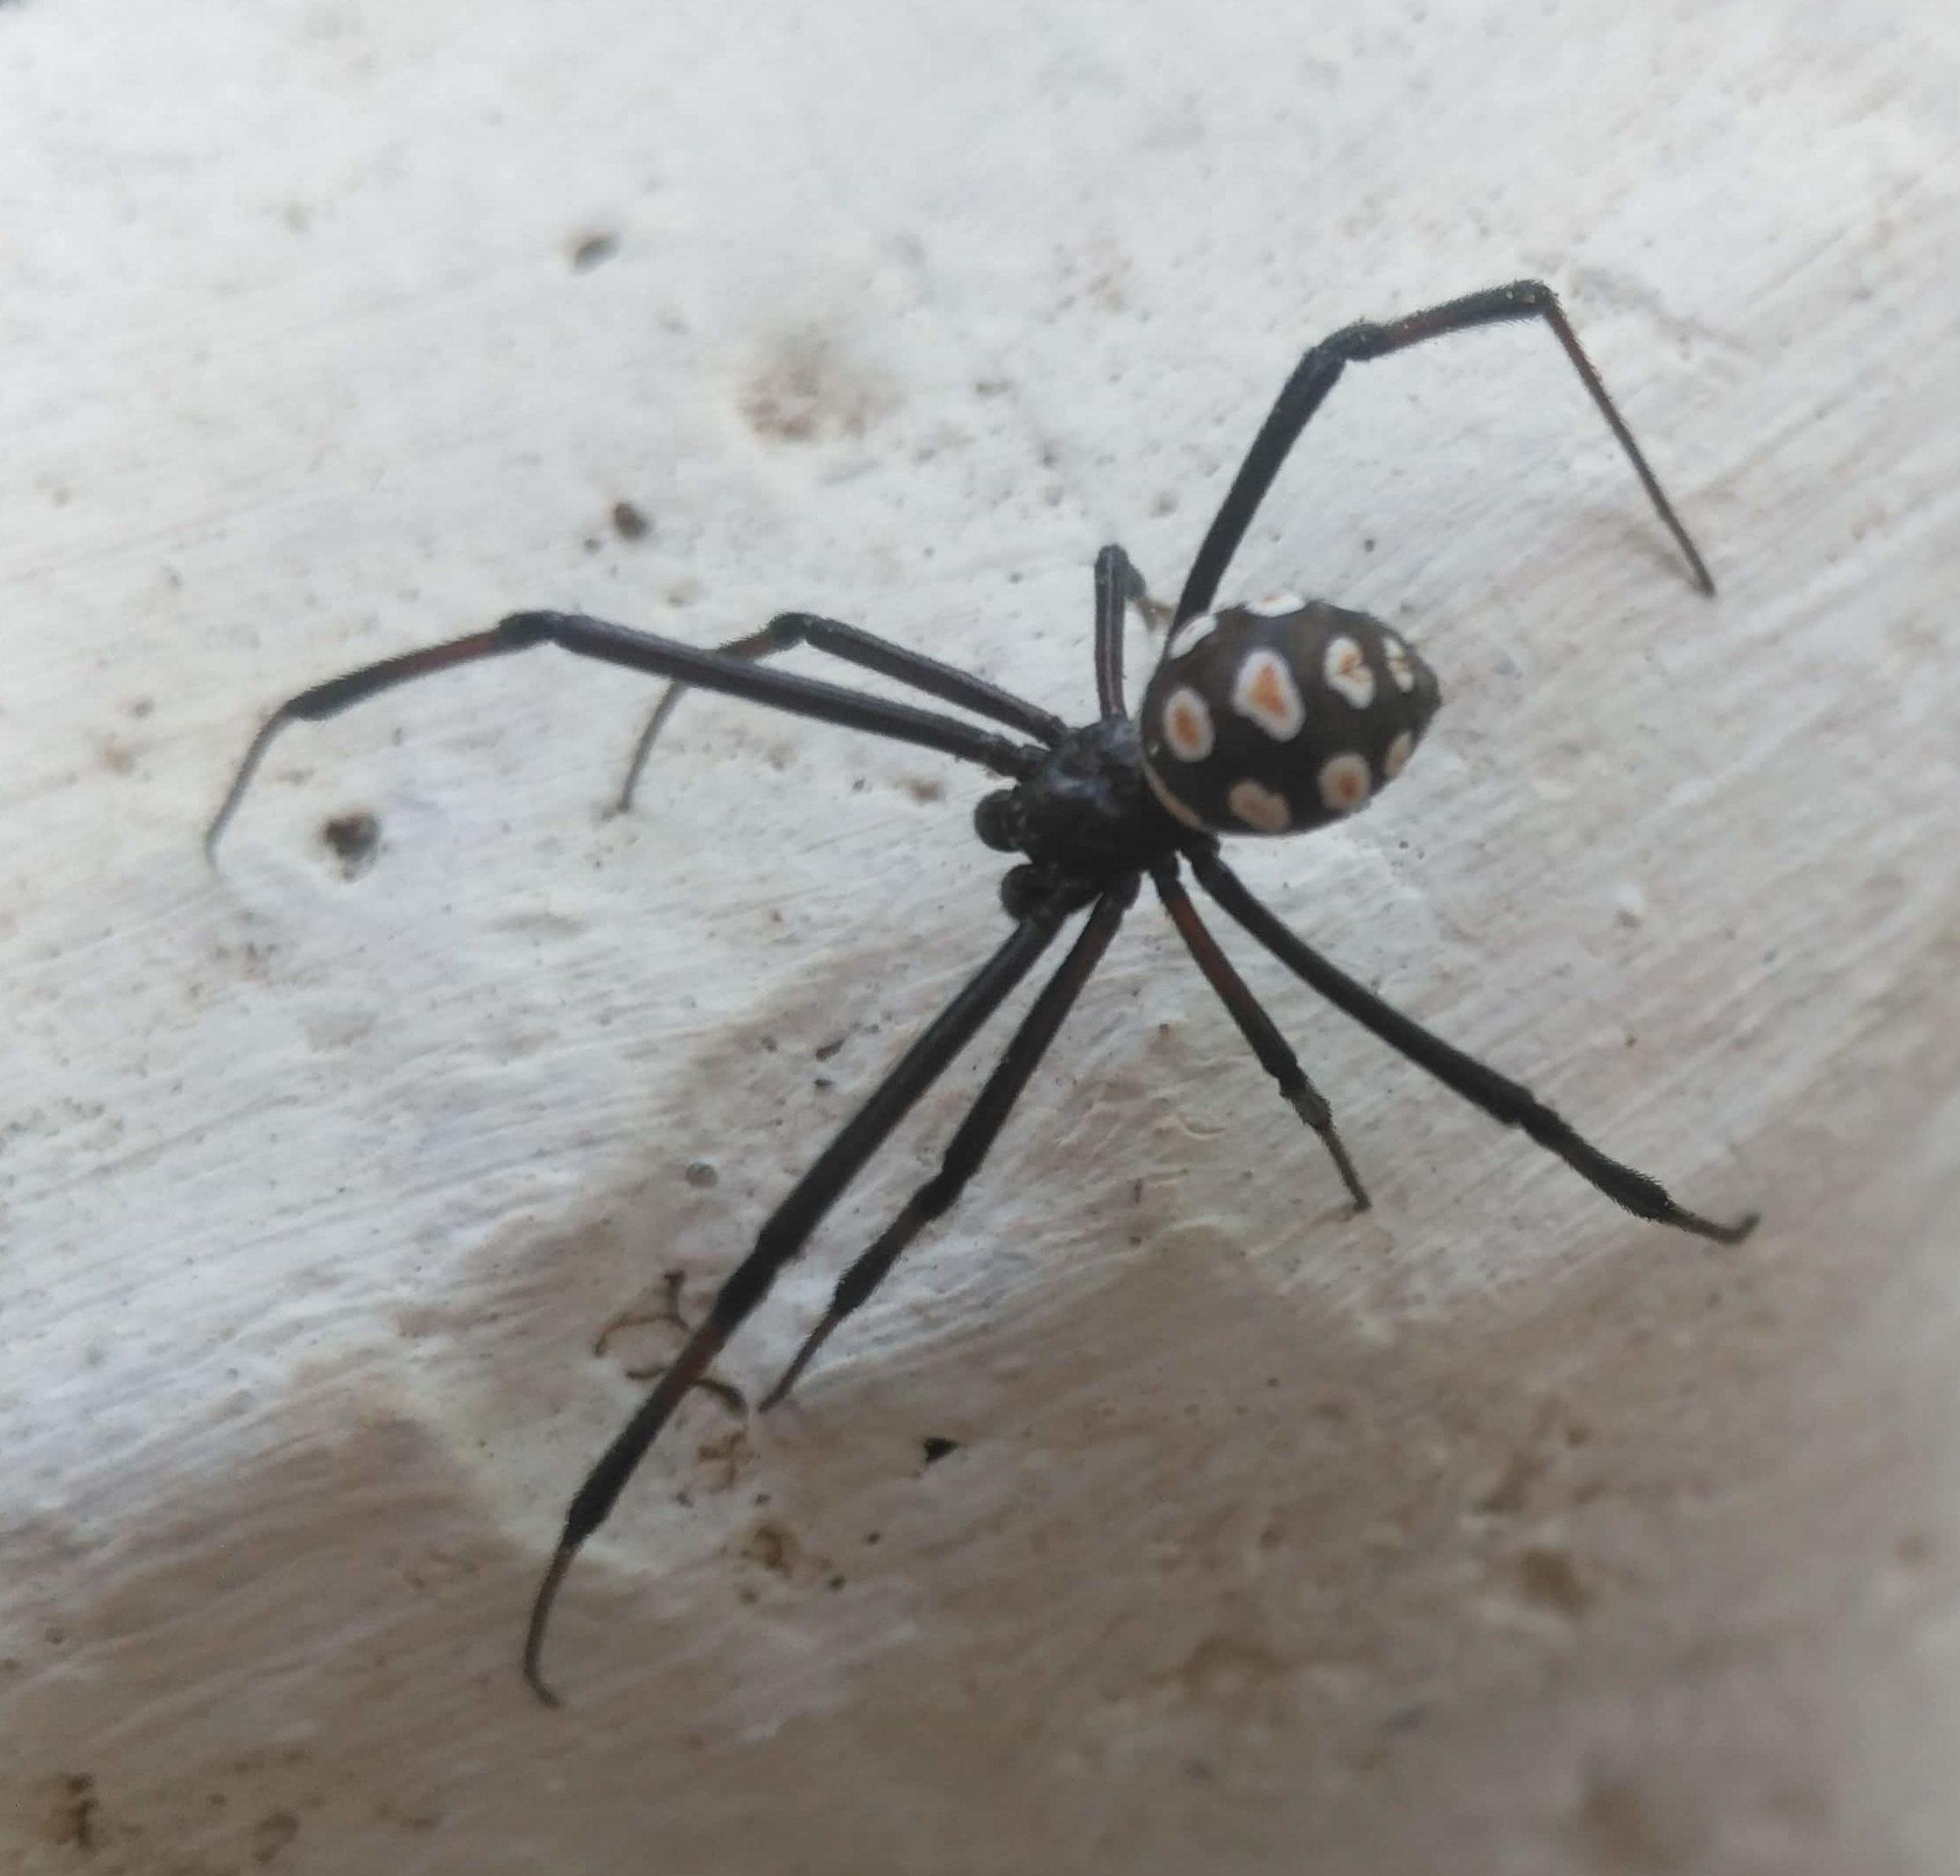 Picture of Latrodectus tredecimguttatus (European Black Widow) - Male - Dorsal